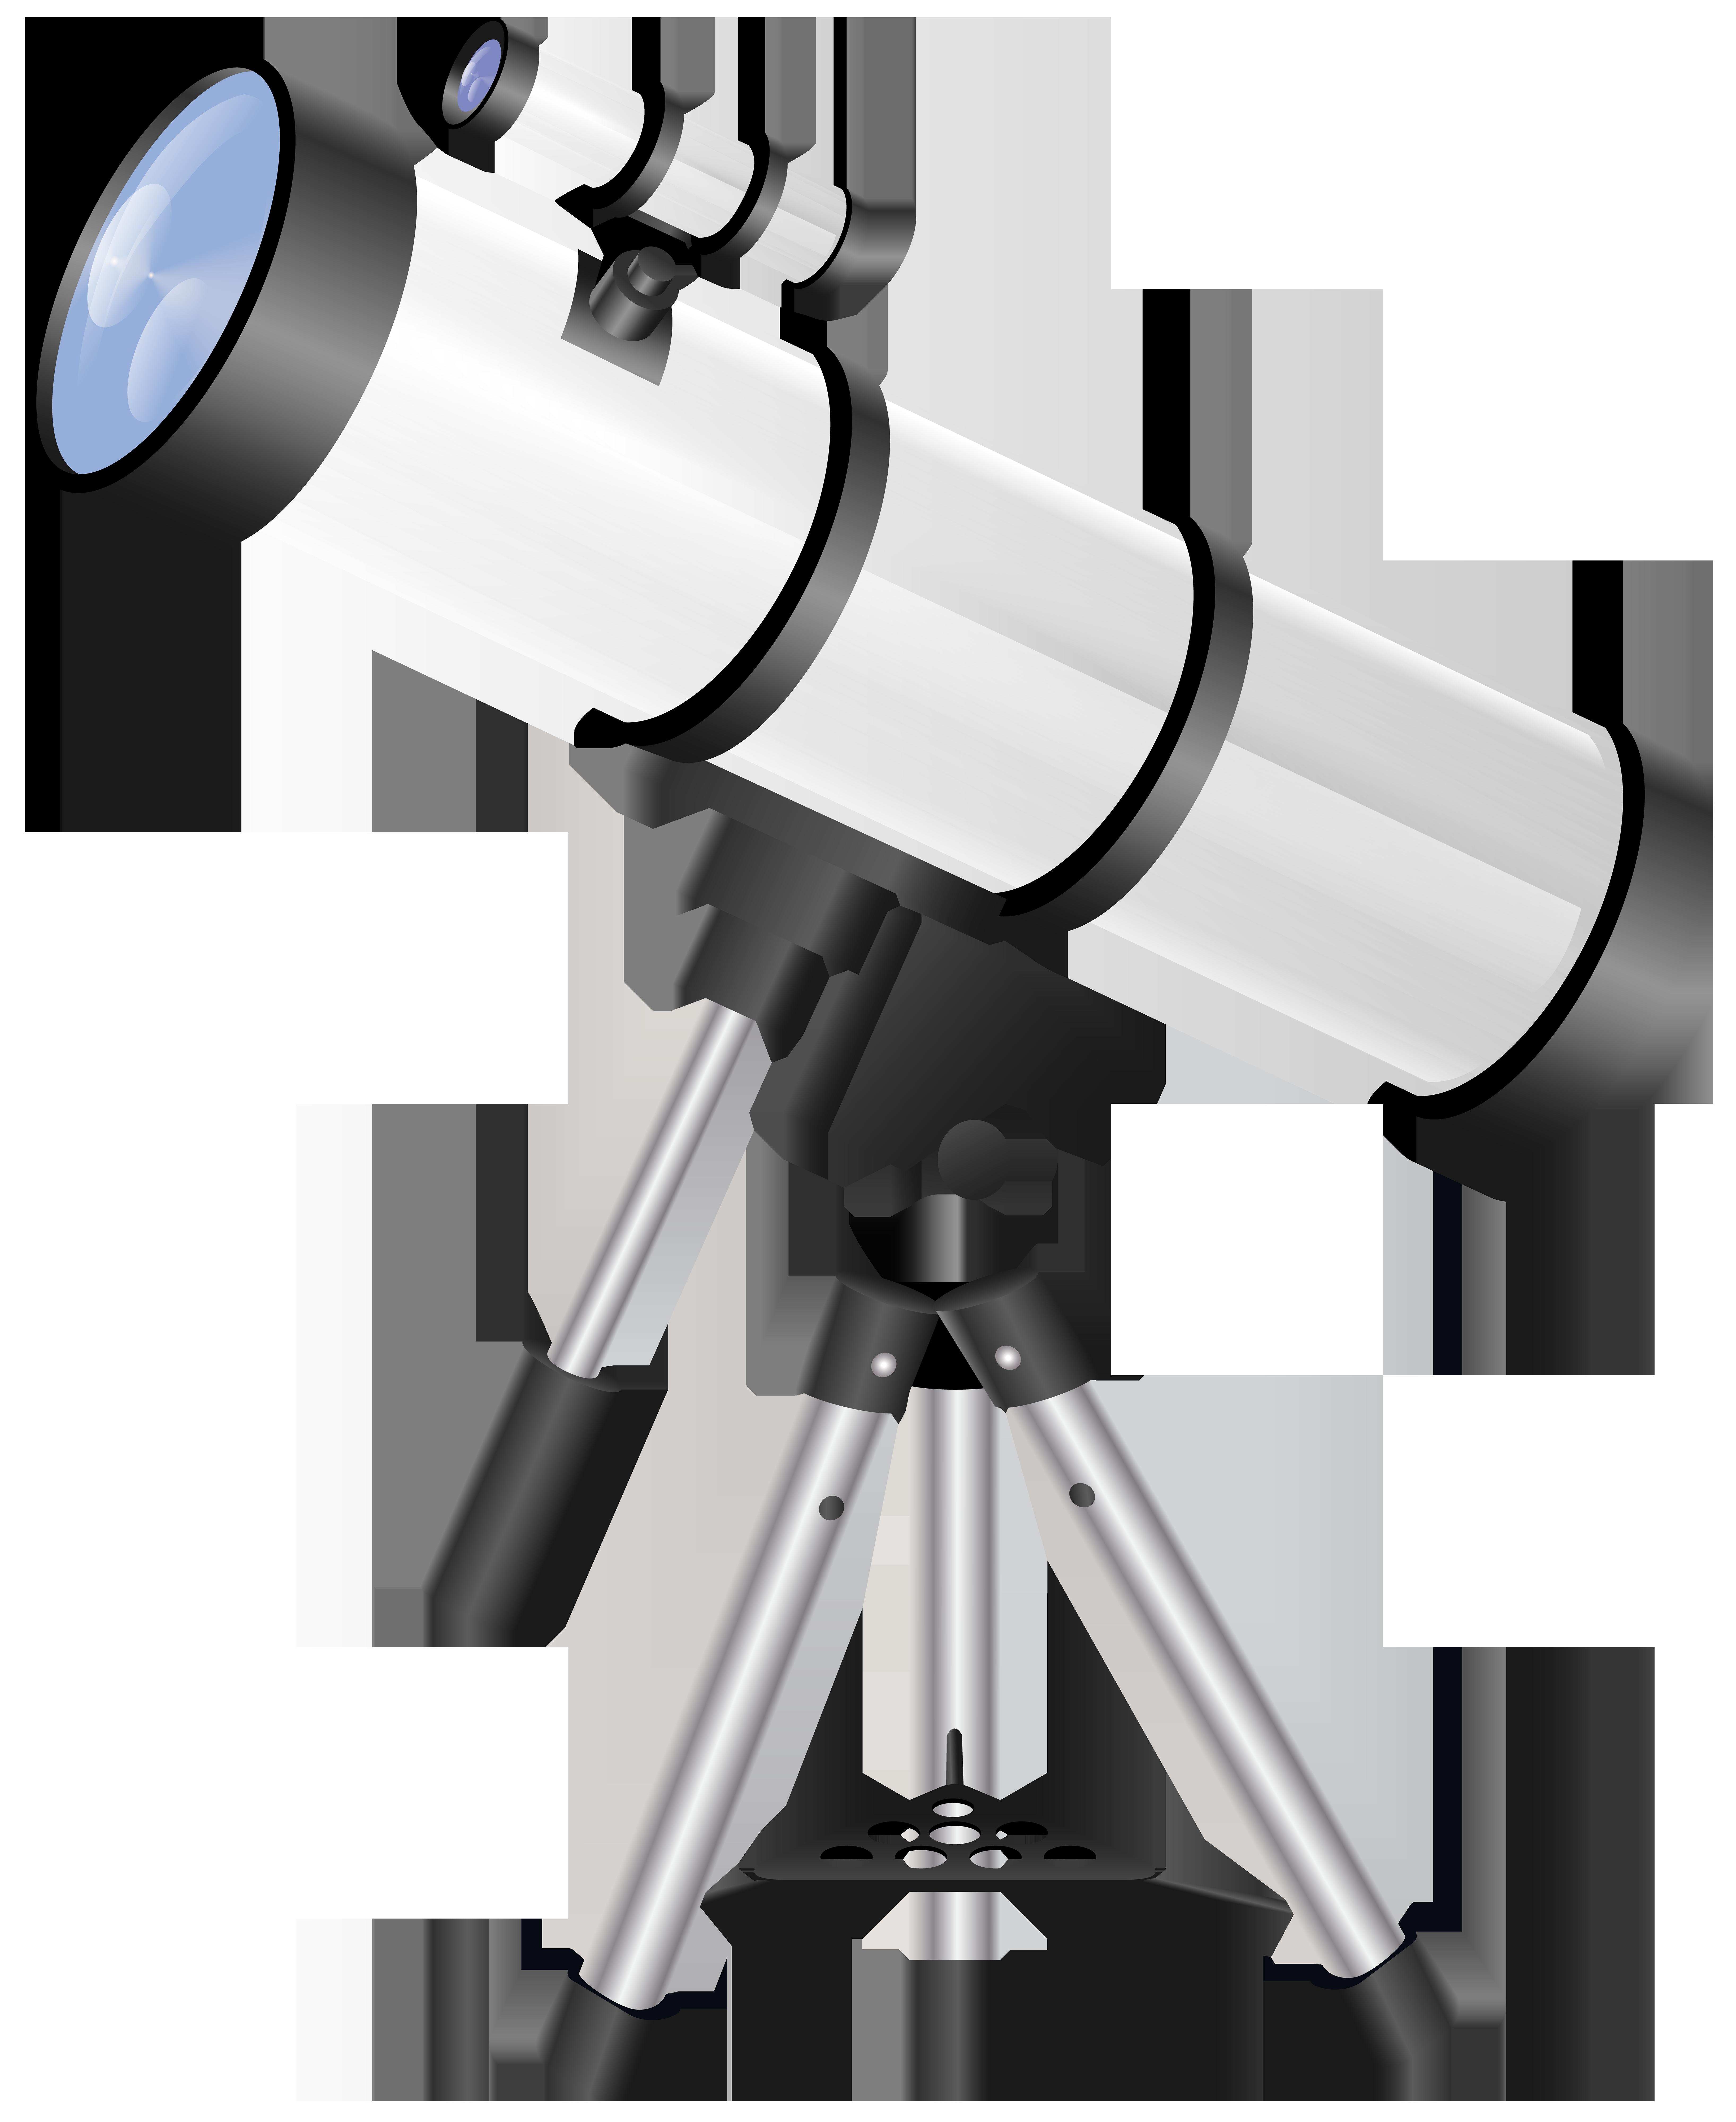 Astronomy clipart transparent. Telescope png clip art